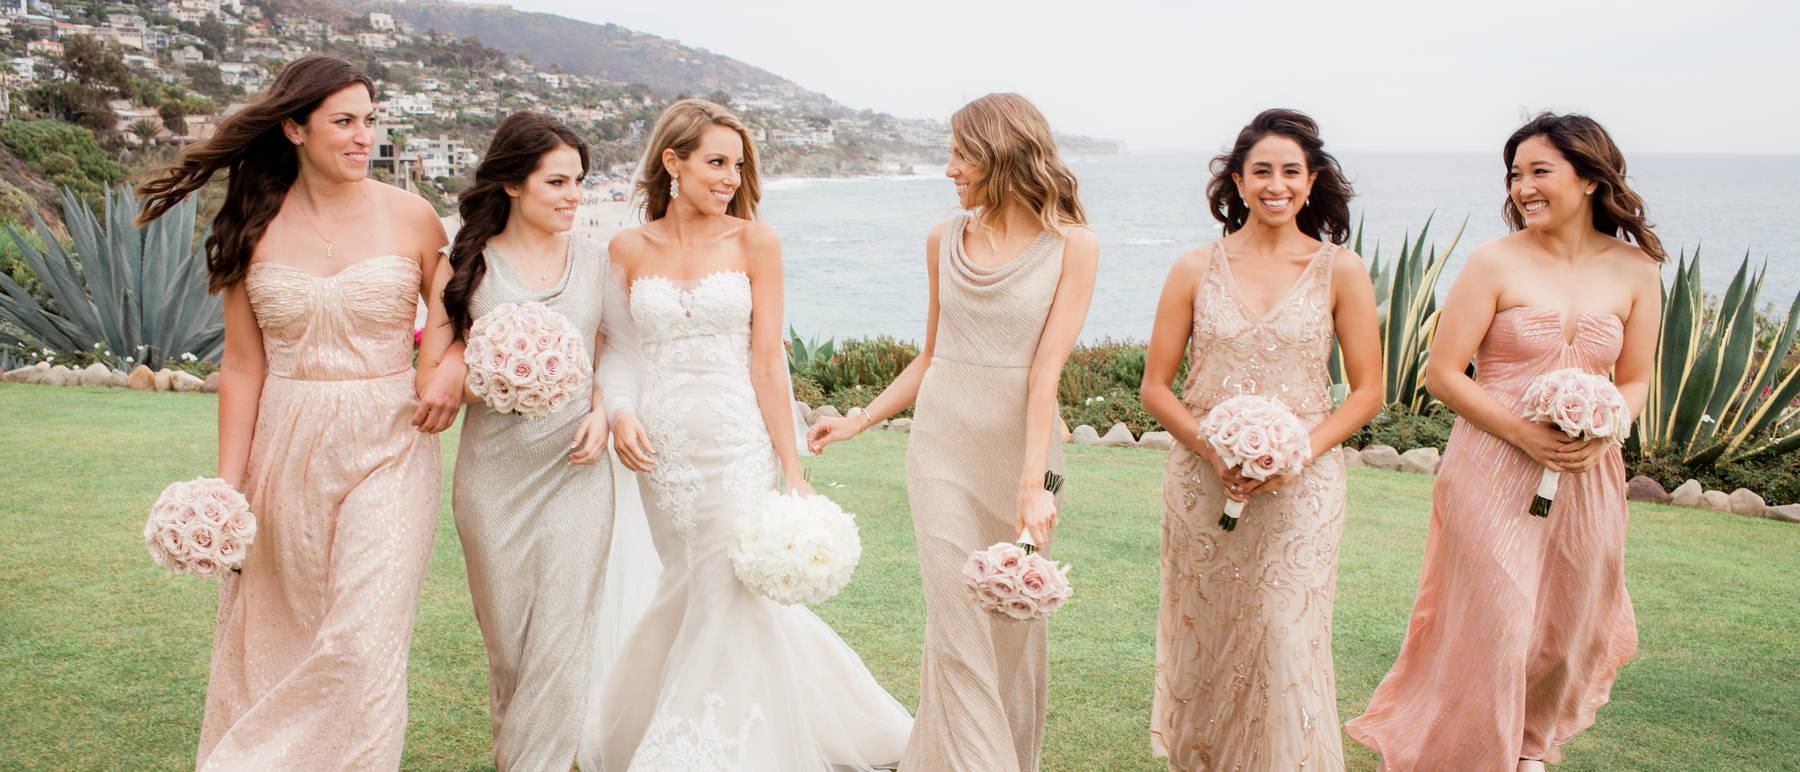 johnandjoseph-wedding-photographer-hz-slider-123